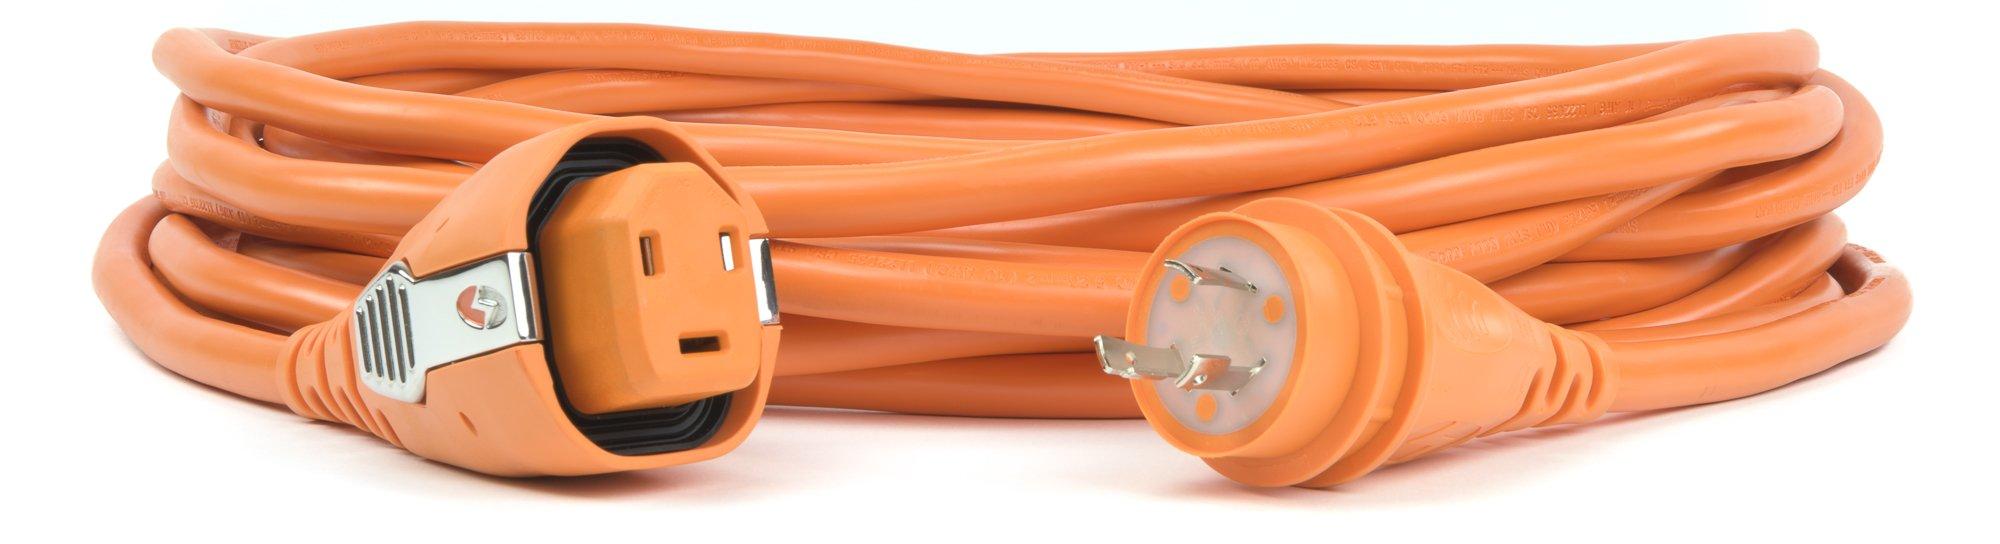 SmartPlug C30503 Dual Configuration 30 Amp Cordset, 50-Feet by Smart Plug